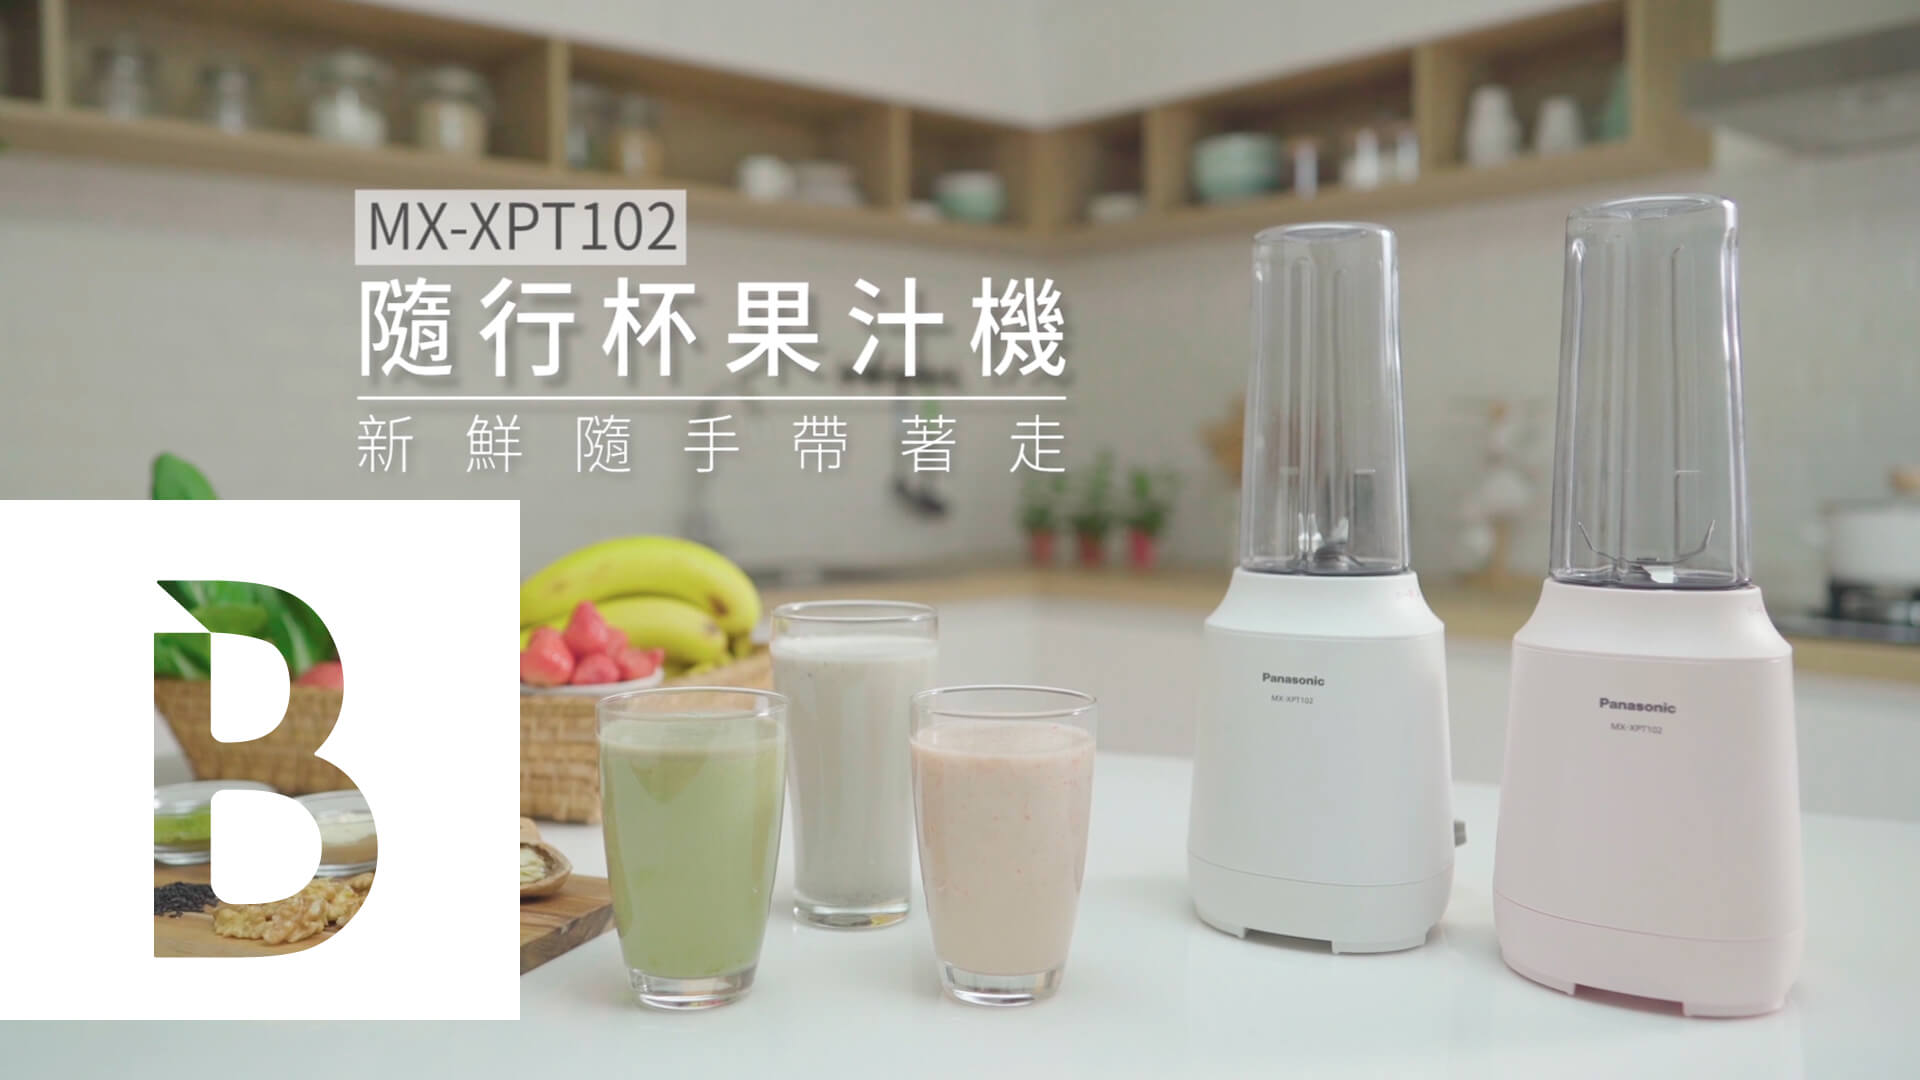 Panasonic隨行杯果汁機,把新鮮健康隨手帶著走!| Bella Taiwan